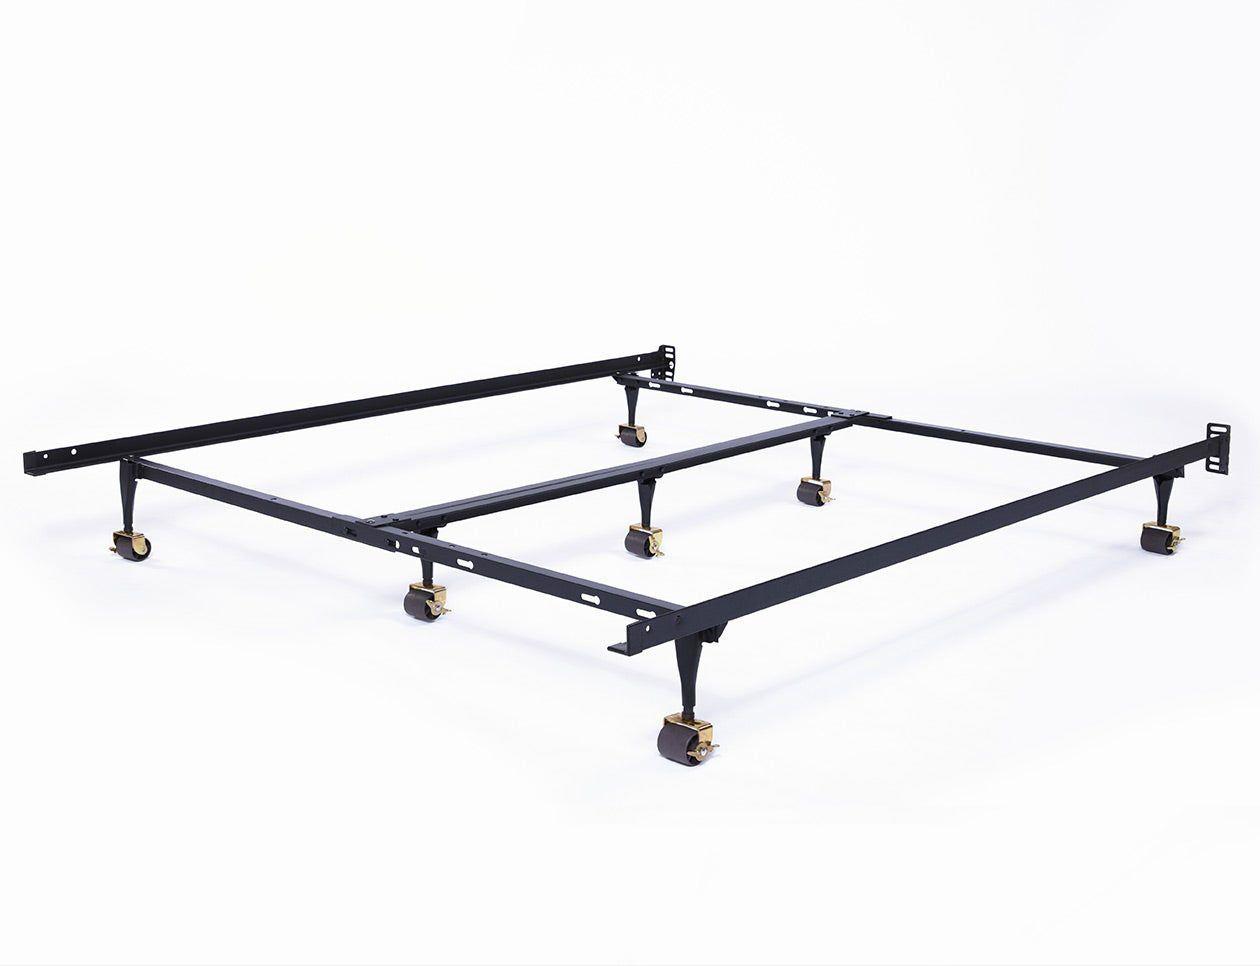 The Nectar Metal Bed Frame Metal Platform Bed Iron Bed Wooden Bed Frames